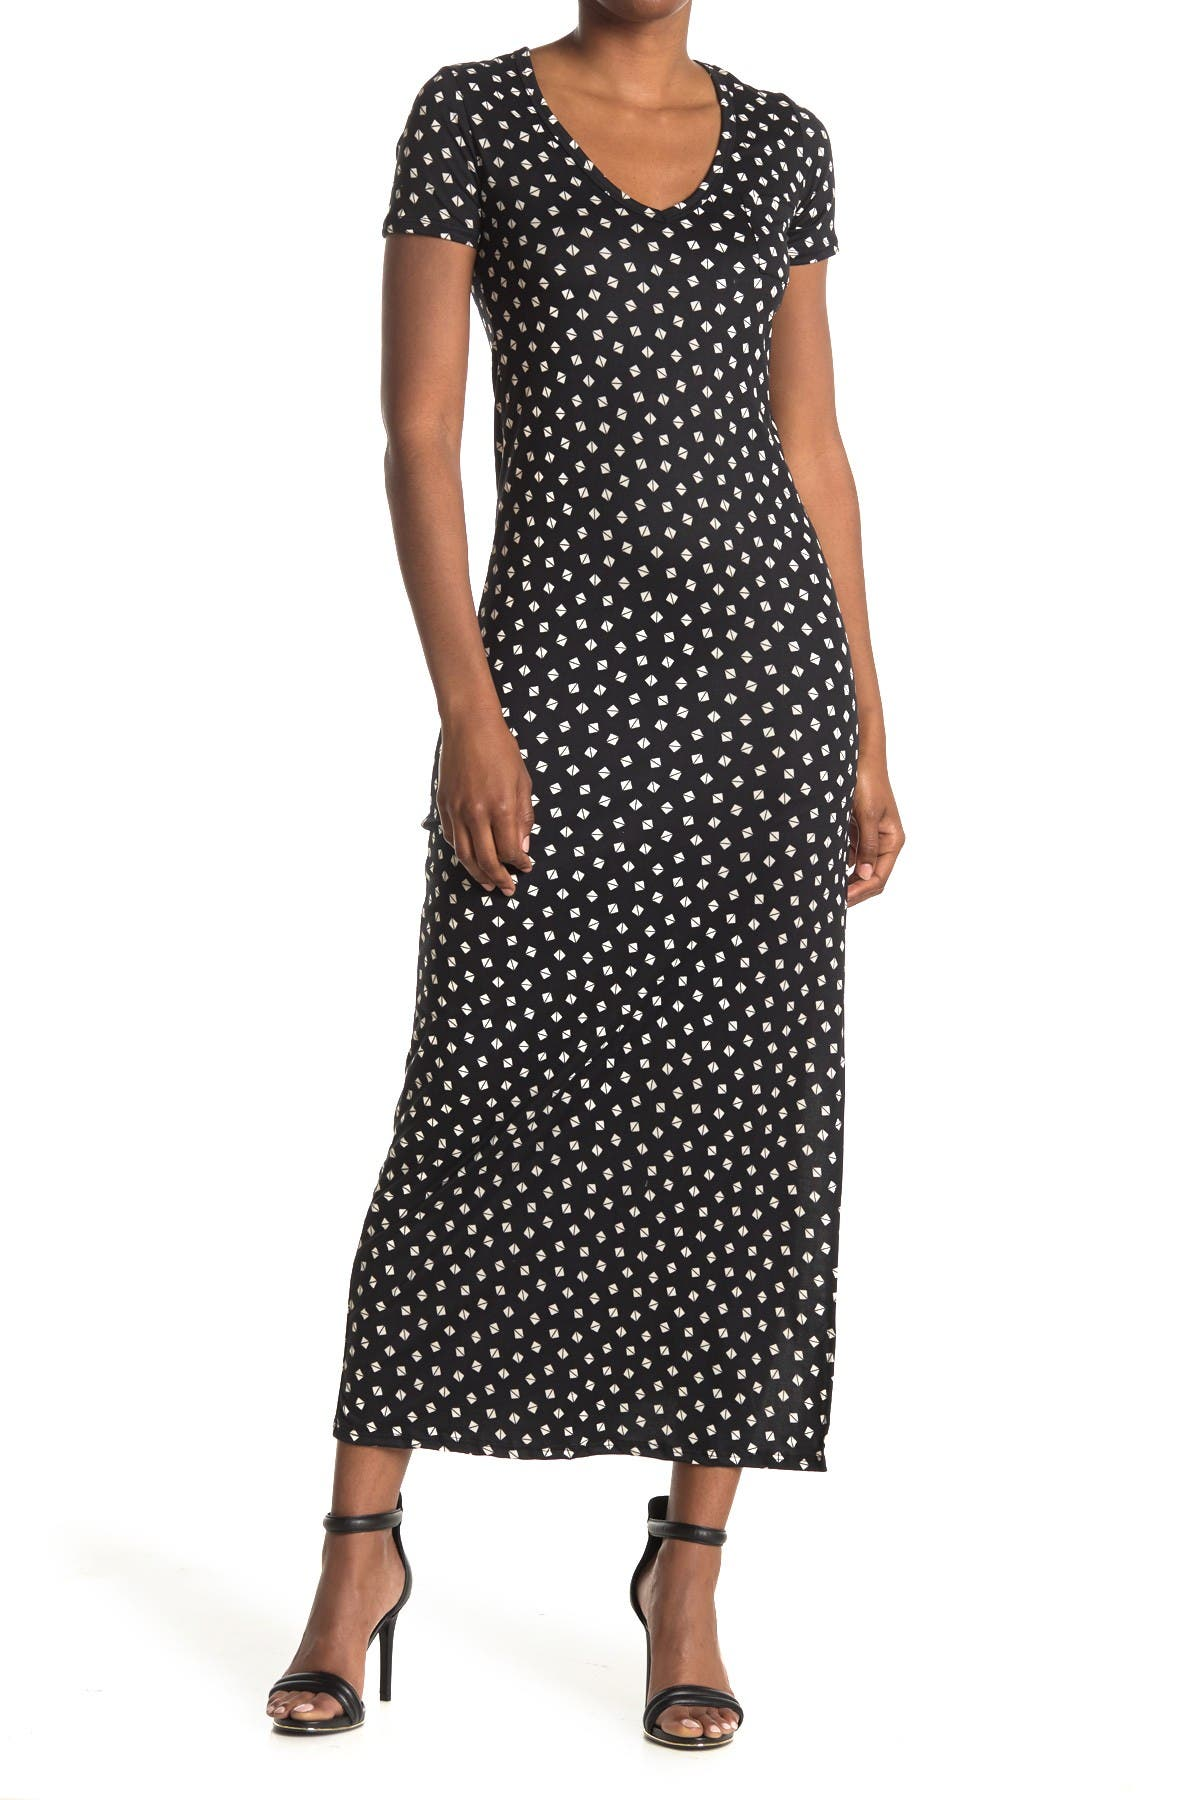 Image of Velvet Torch Geo Print Pocket Maxi Dress